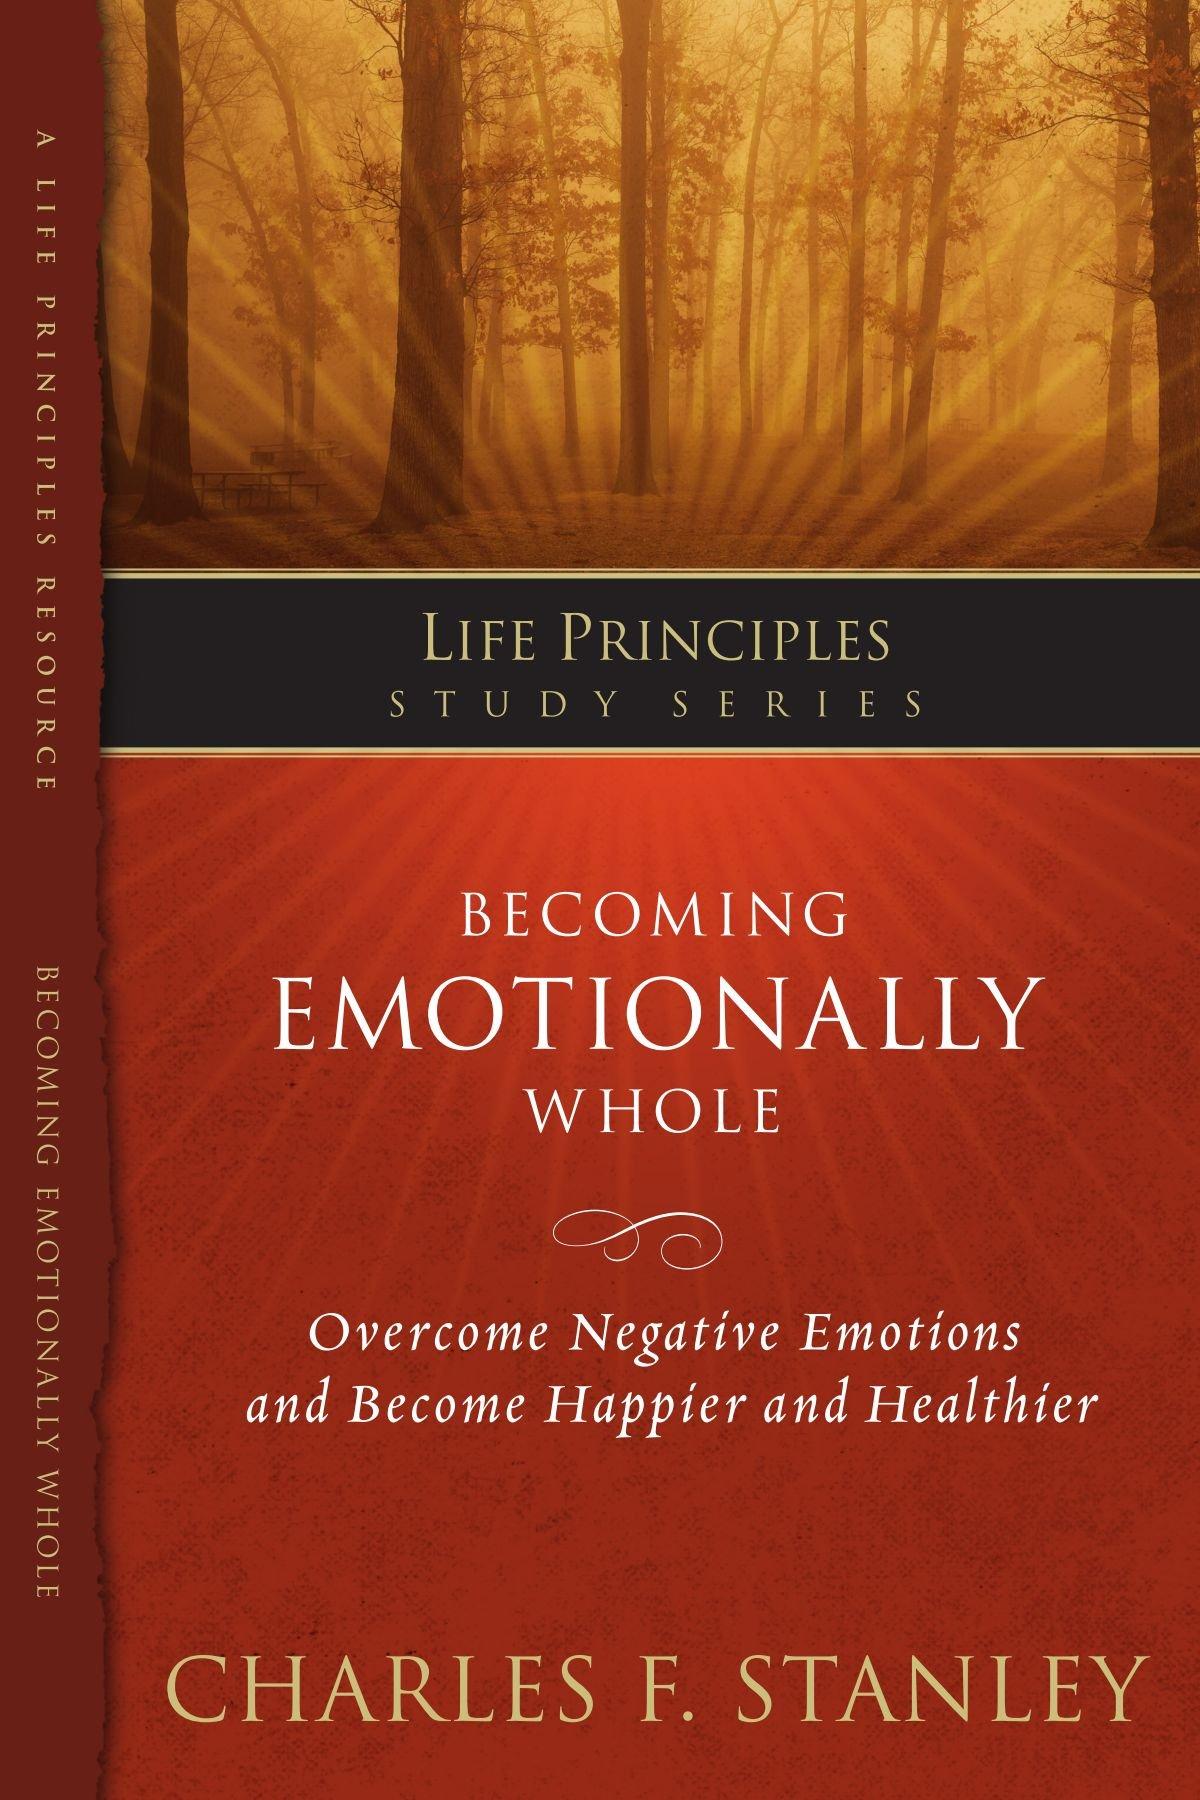 Becoming Emotionally Whole (Life Principles Study Series)